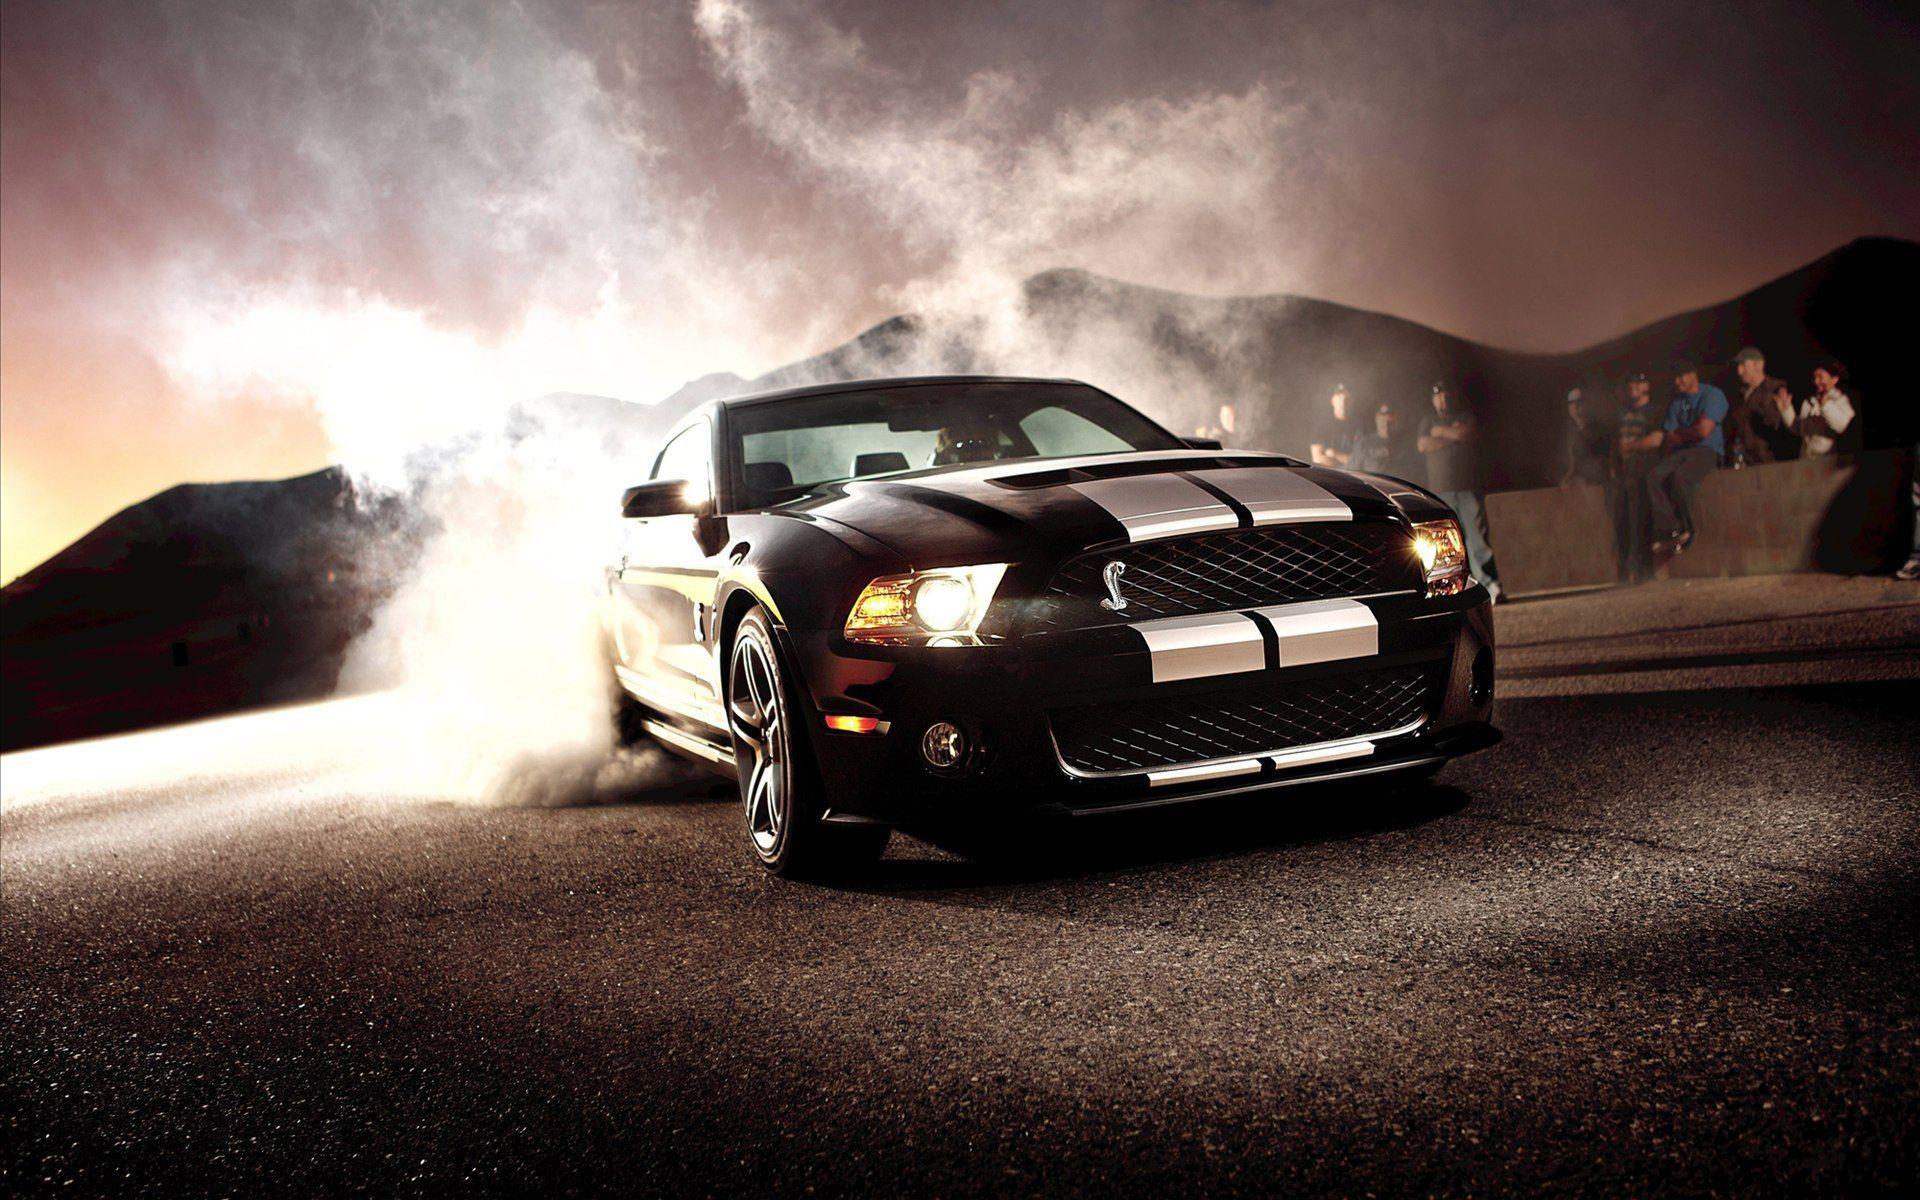 Mustang wallpapers free SF